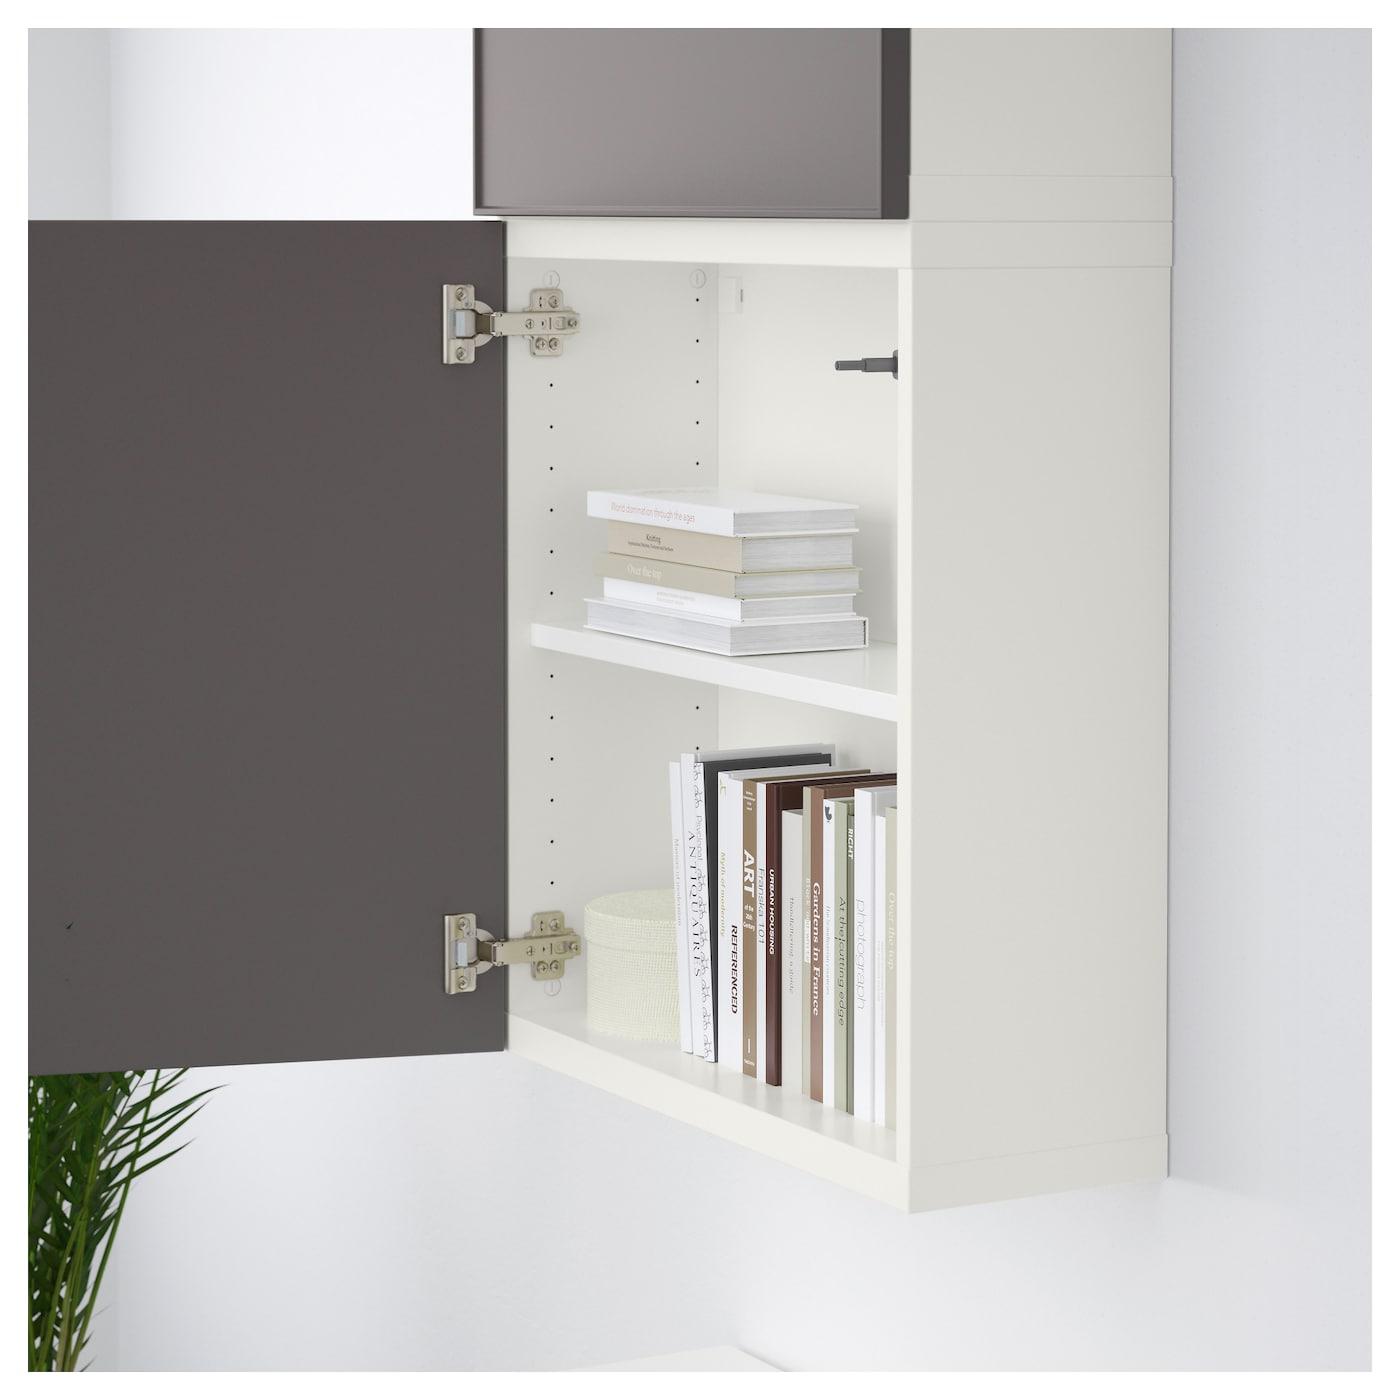 best wall cabinet with 2 doors white grundsviken dark grey 60 x 20 x 128 cm ikea. Black Bedroom Furniture Sets. Home Design Ideas